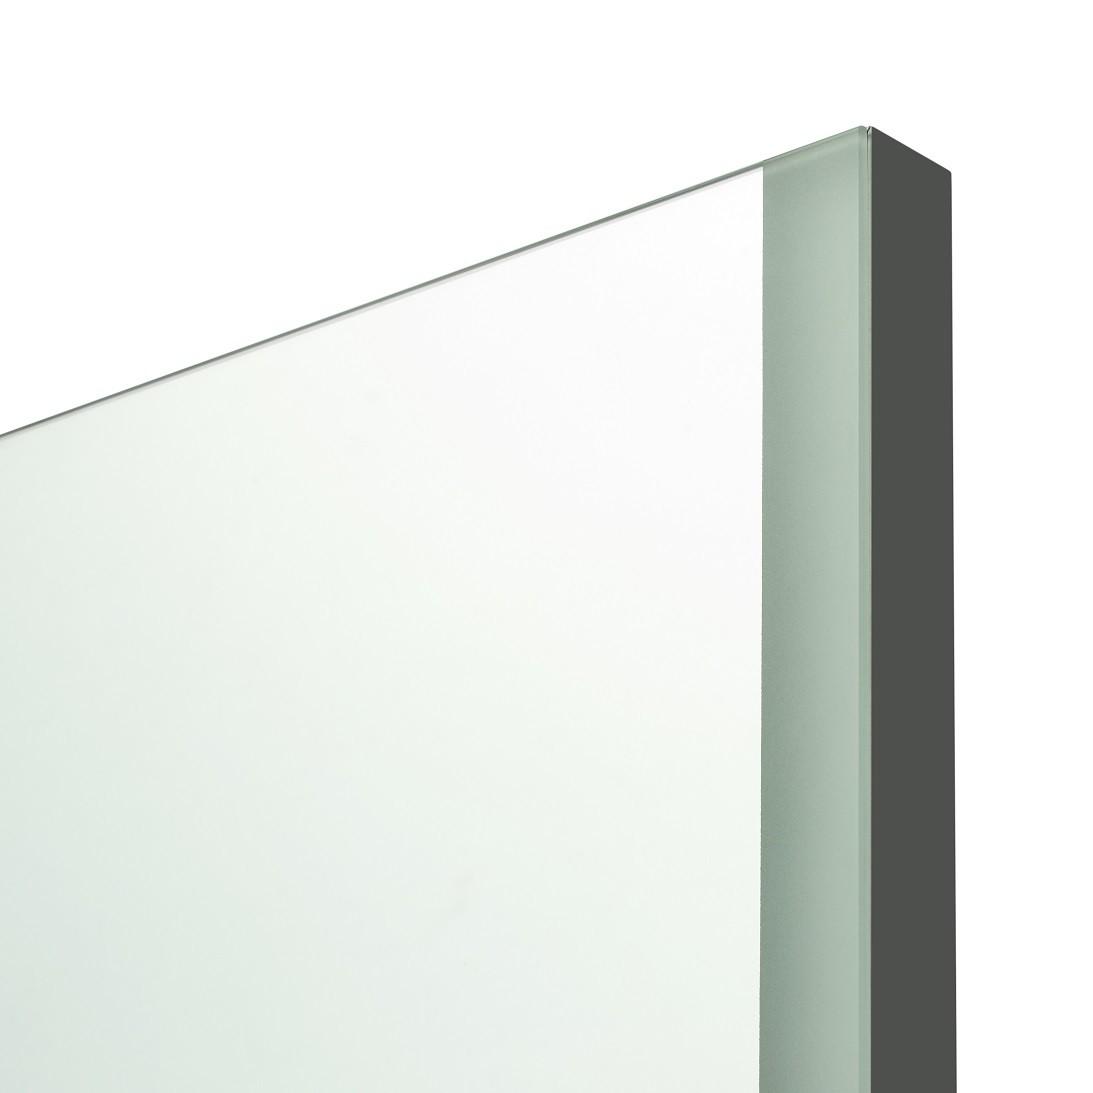 Зеркало Акватон Терра 70 с модулем Терра 35